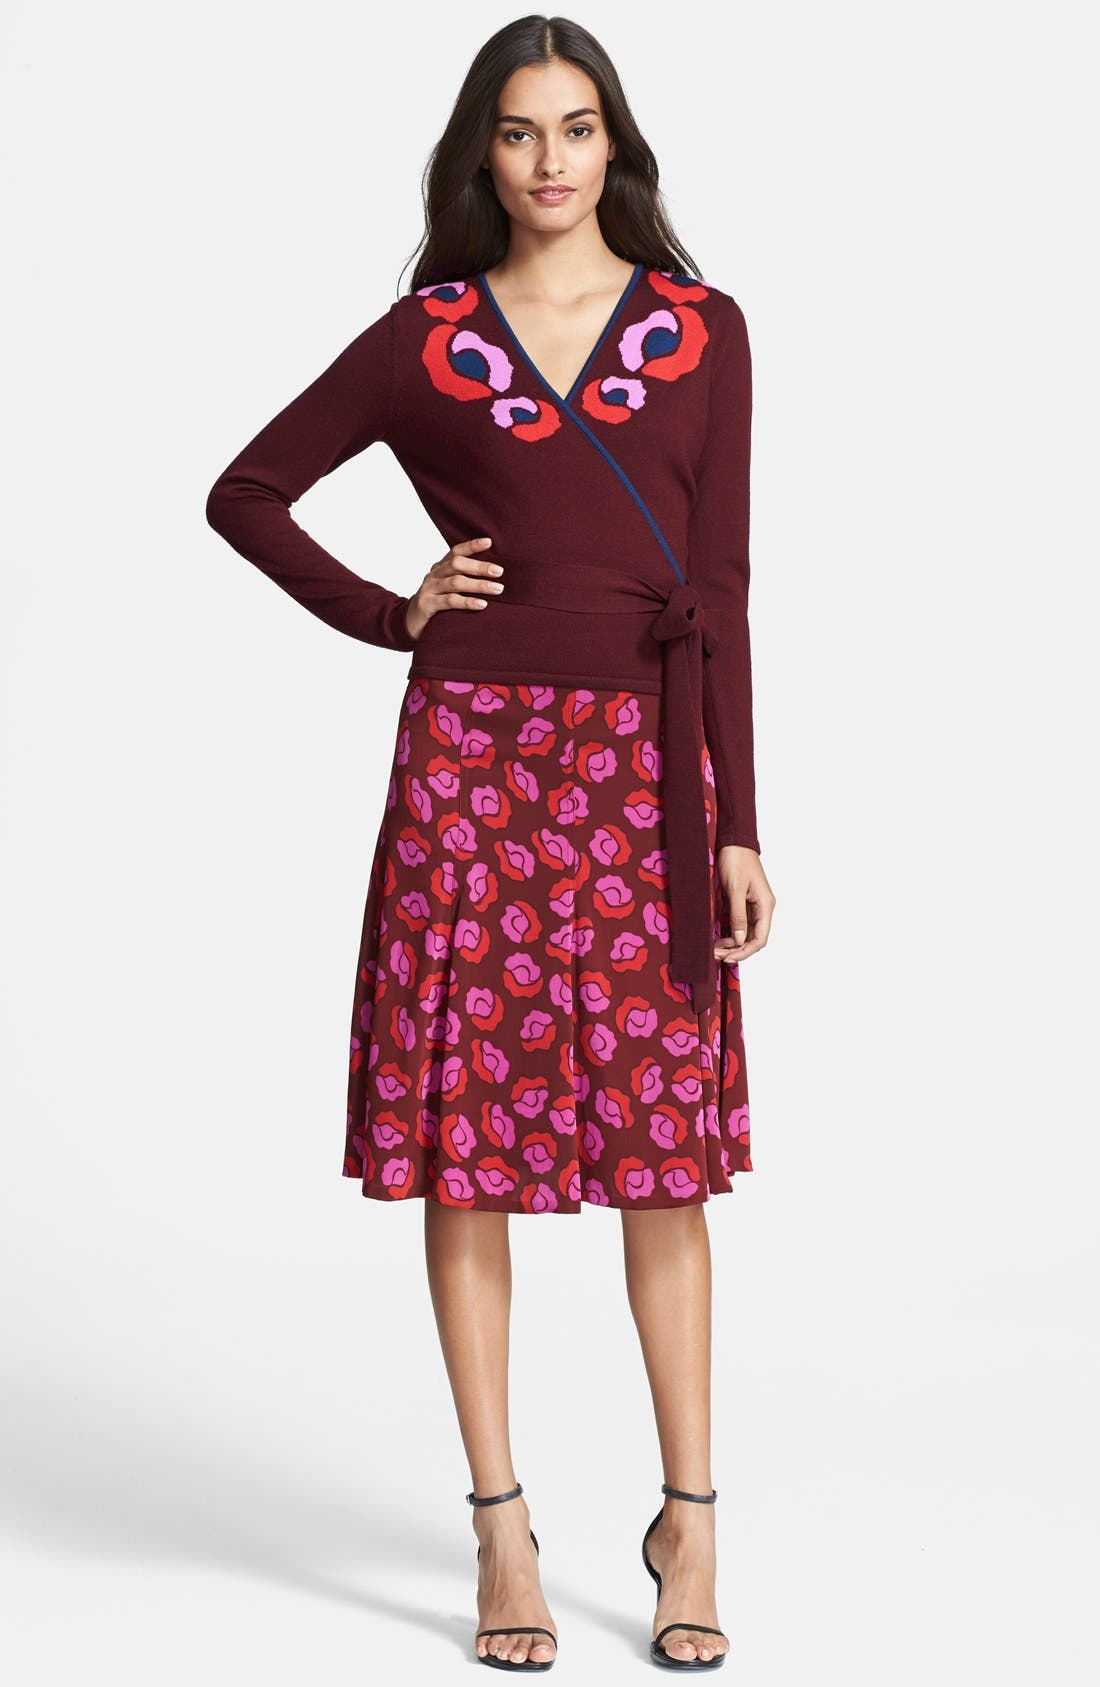 Alternate Image 1 Selected - Diane von Furstenberg 'Ballerina' Long Sleeve Sweater